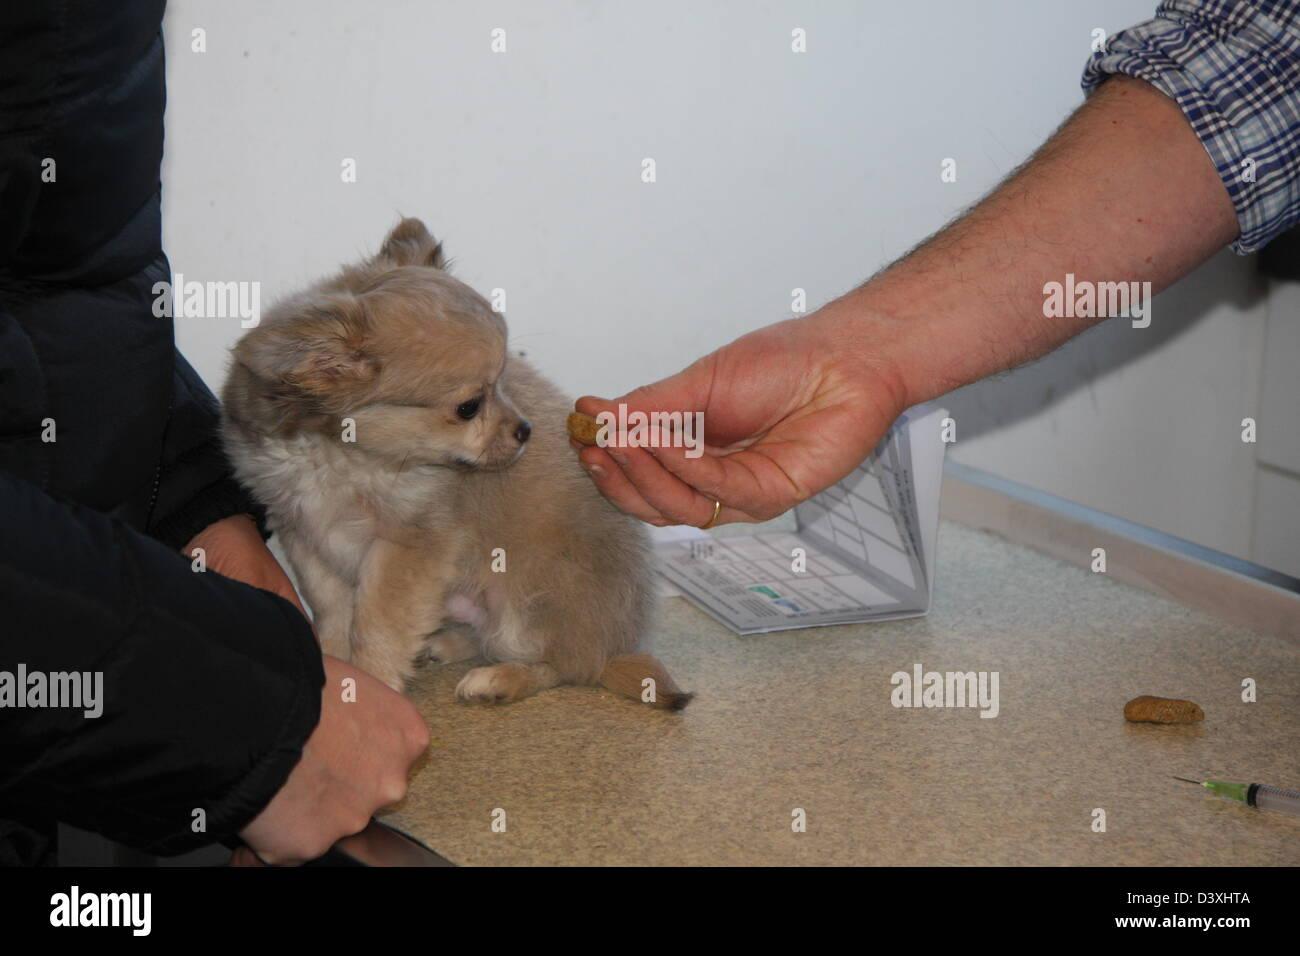 Chihuahua Dog  /  the veterinary gives a reward to a good dog - Stock Image